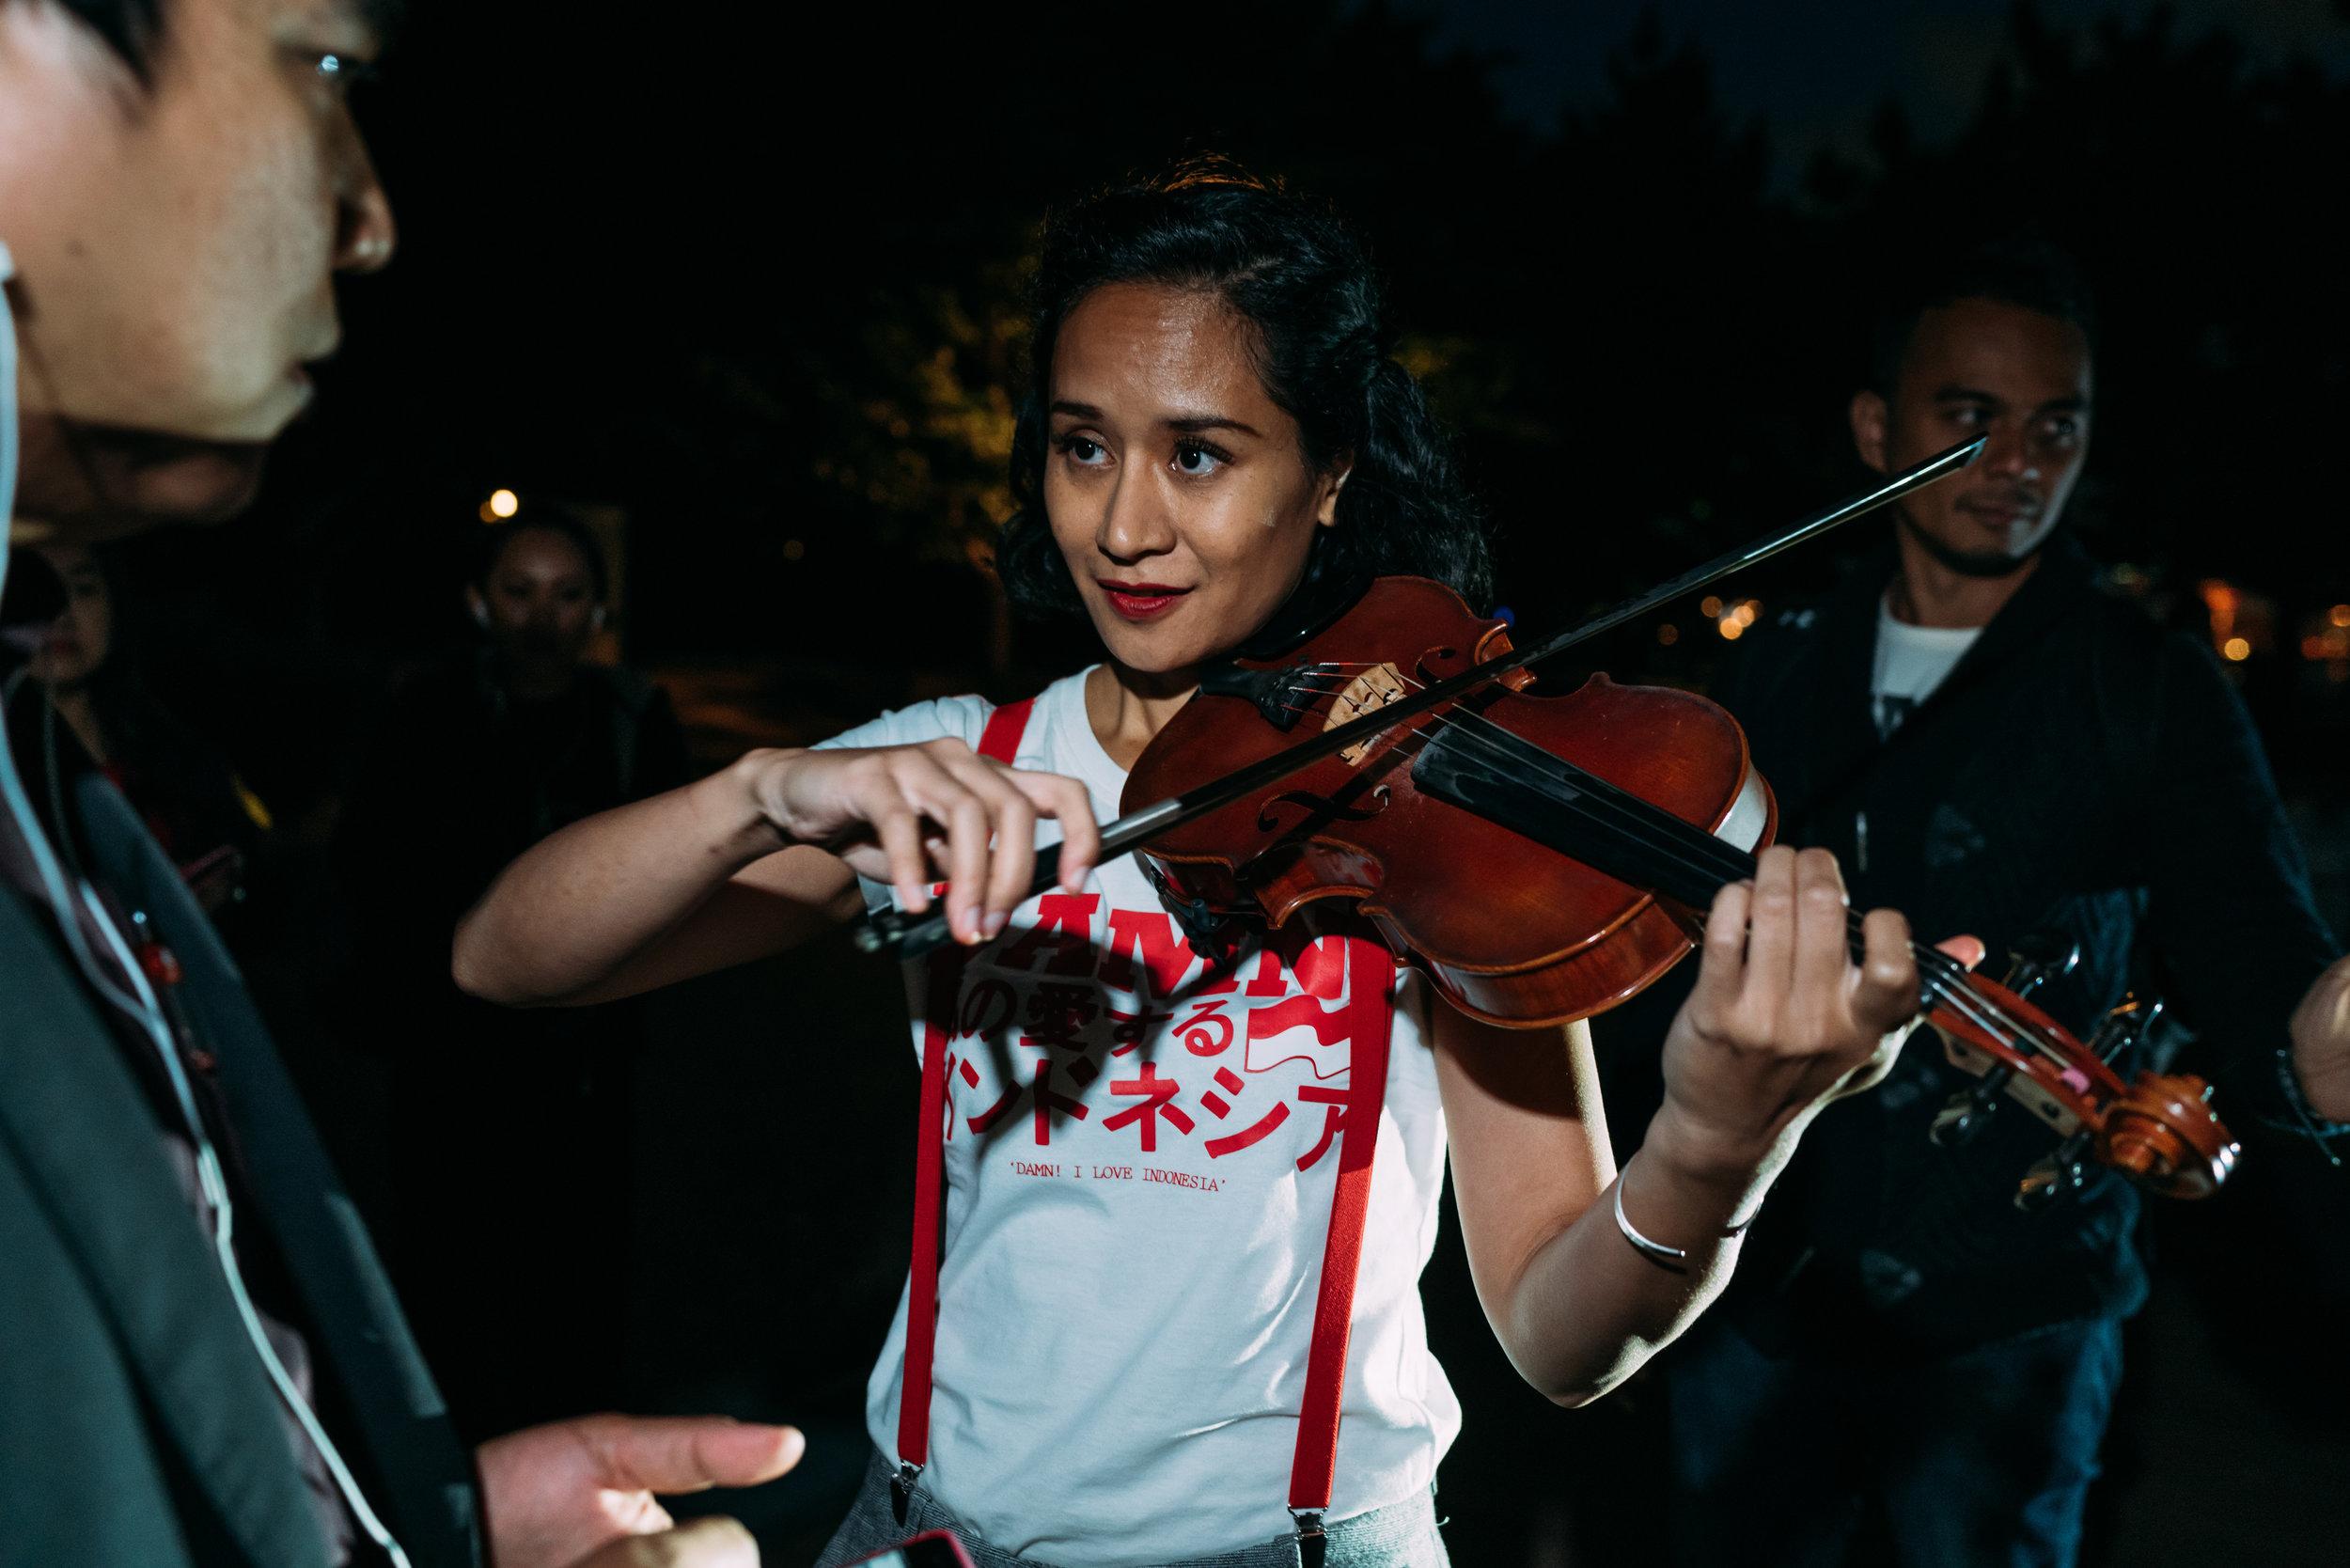 Three Indonesian anthems, Indonesia Saya, Tanah Airku, and Indonesia Pusaka was sung together led by Indonesian musician Maylaffayza playing the violin.